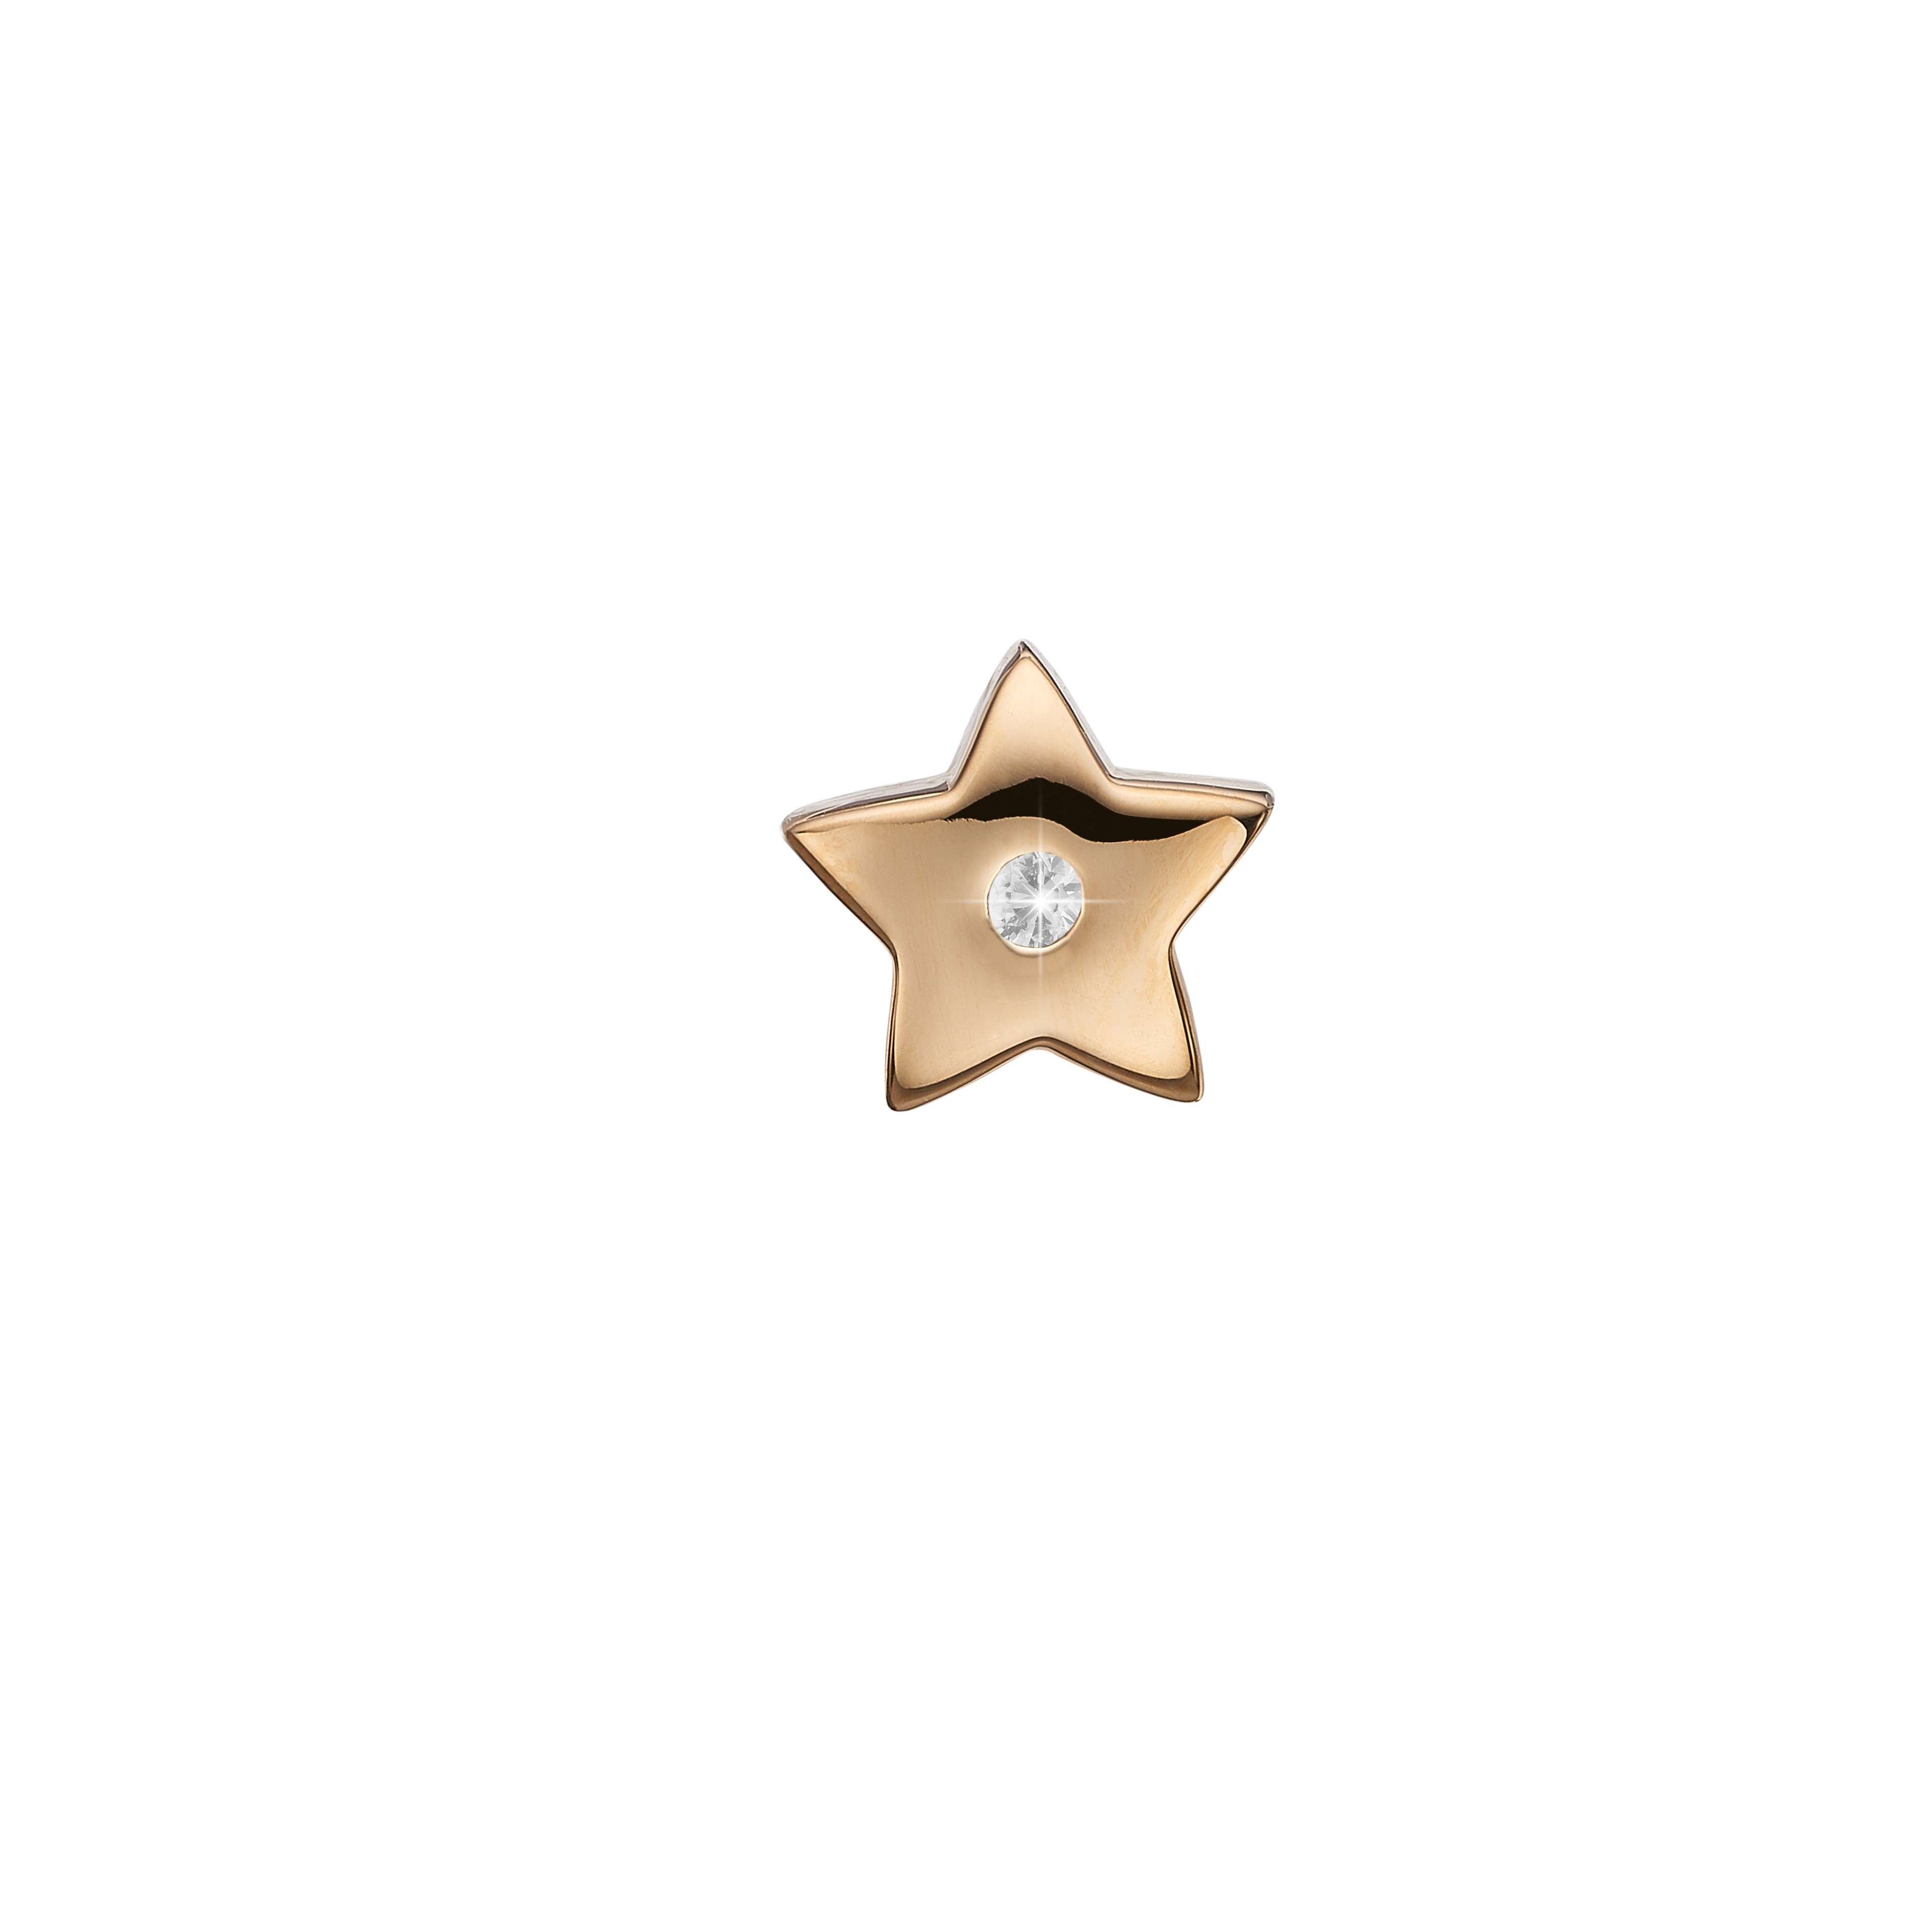 CHRISTINA Dreaming star - 623-G88